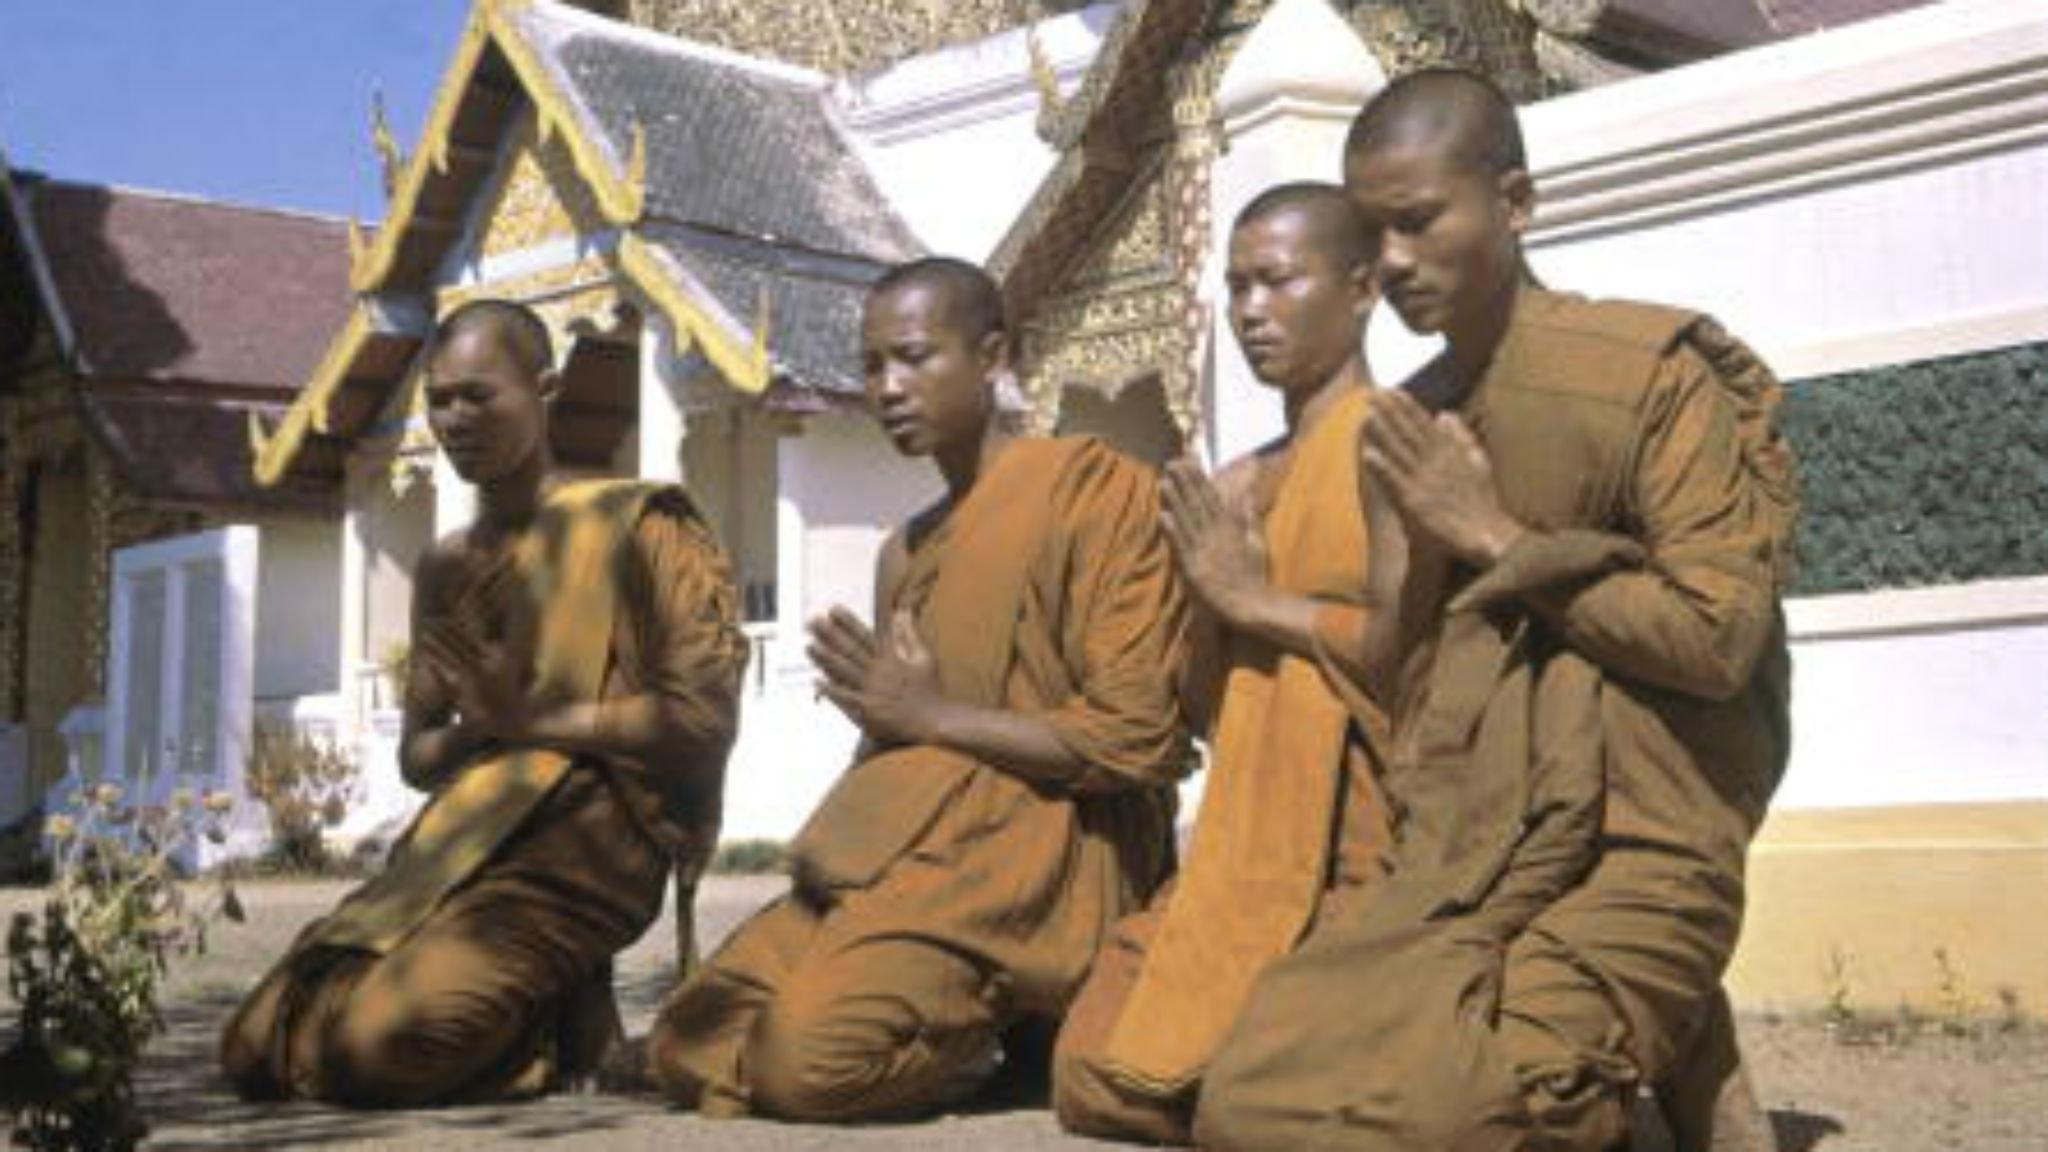 Munkar i Tailand.